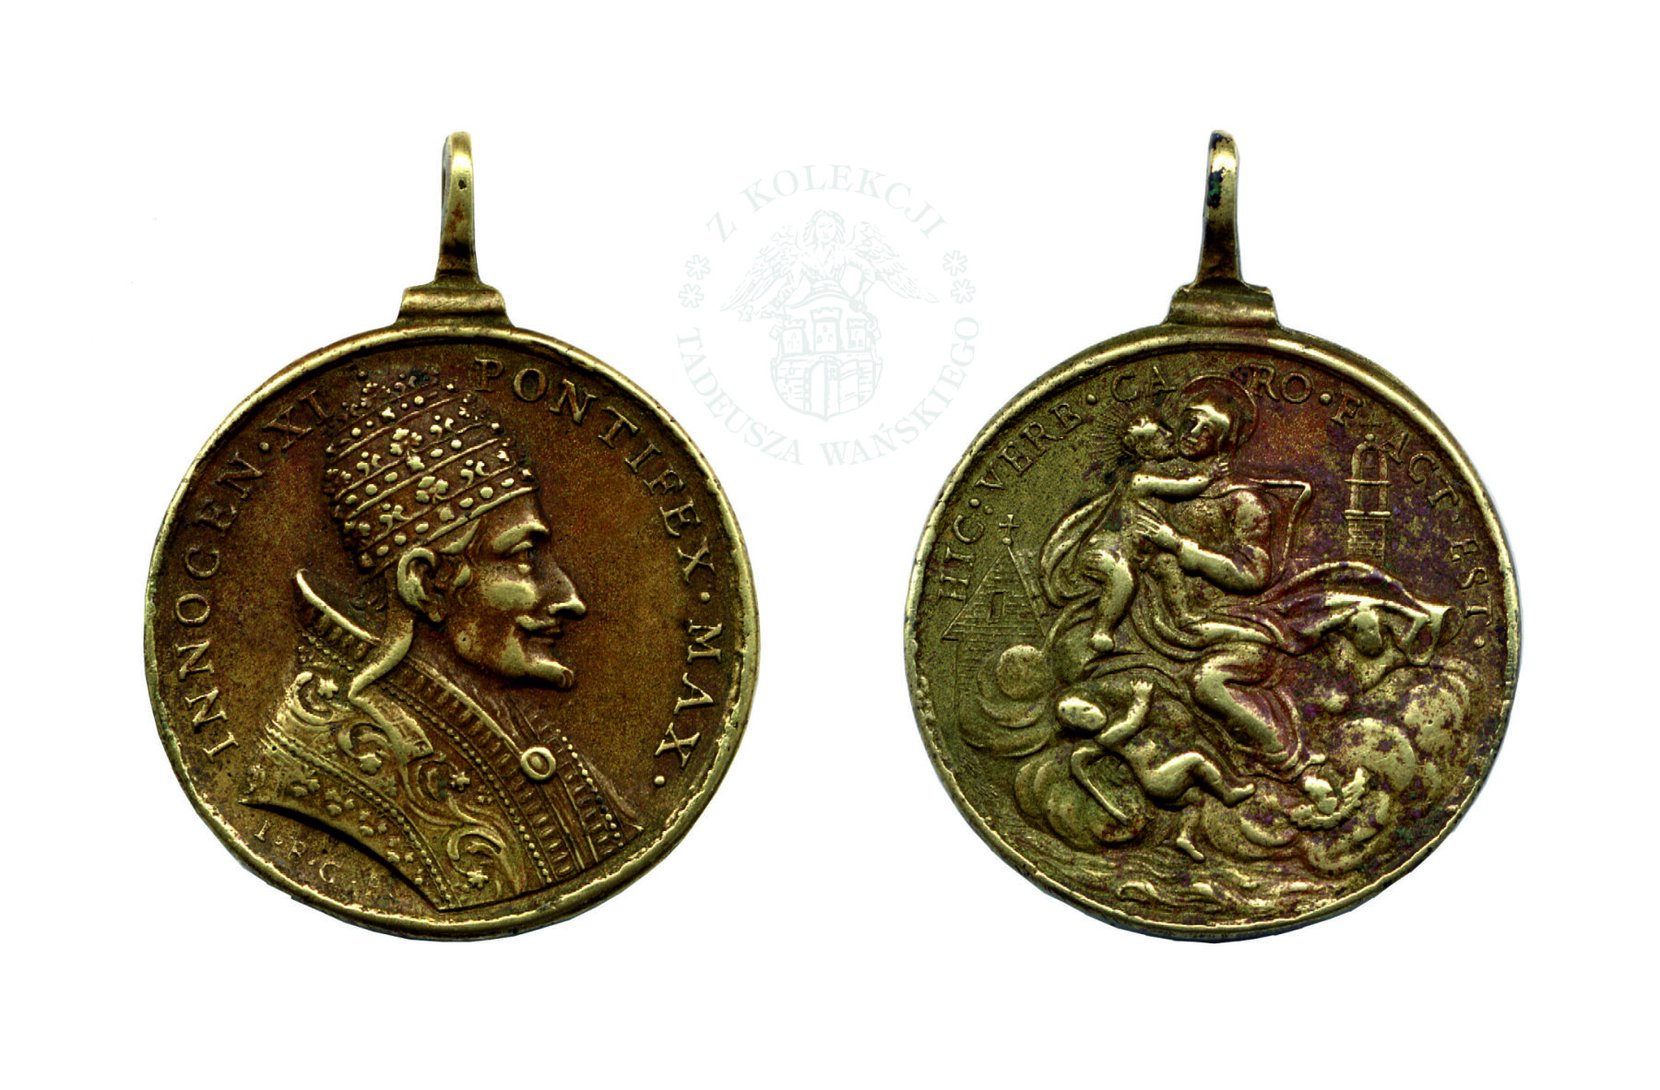 medalik innocenty xi (xvii w.) numismatics coins